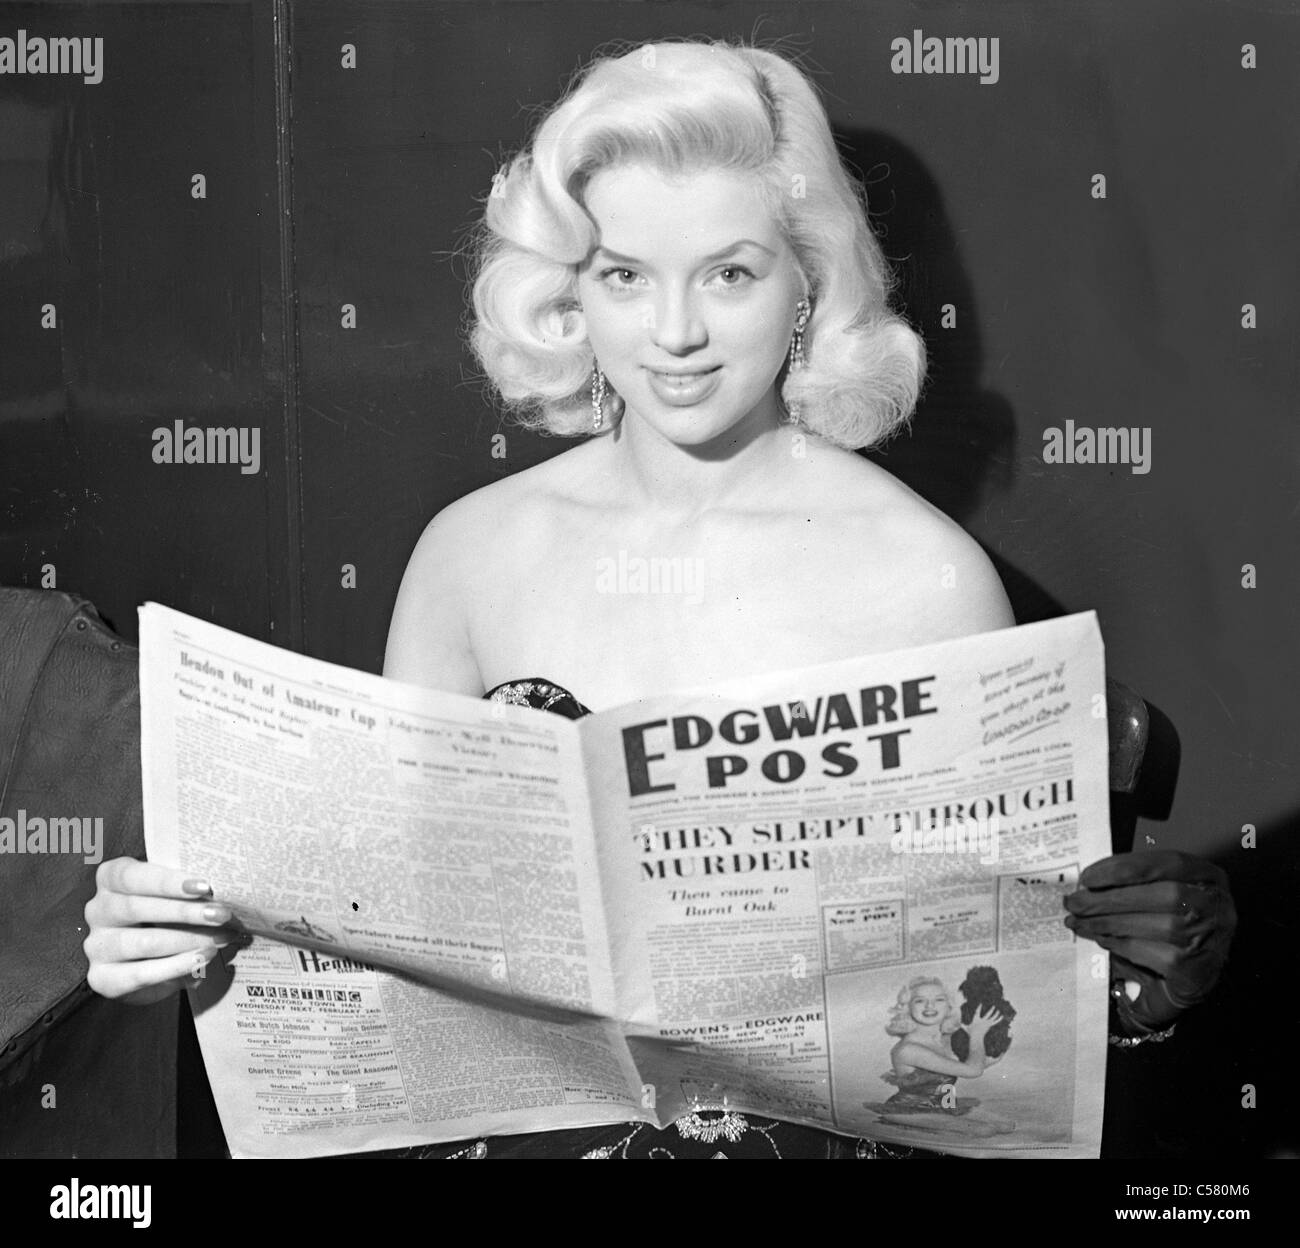 British actress Diana Dors reading the Edgware Post newspaper 1954 - Stock Image